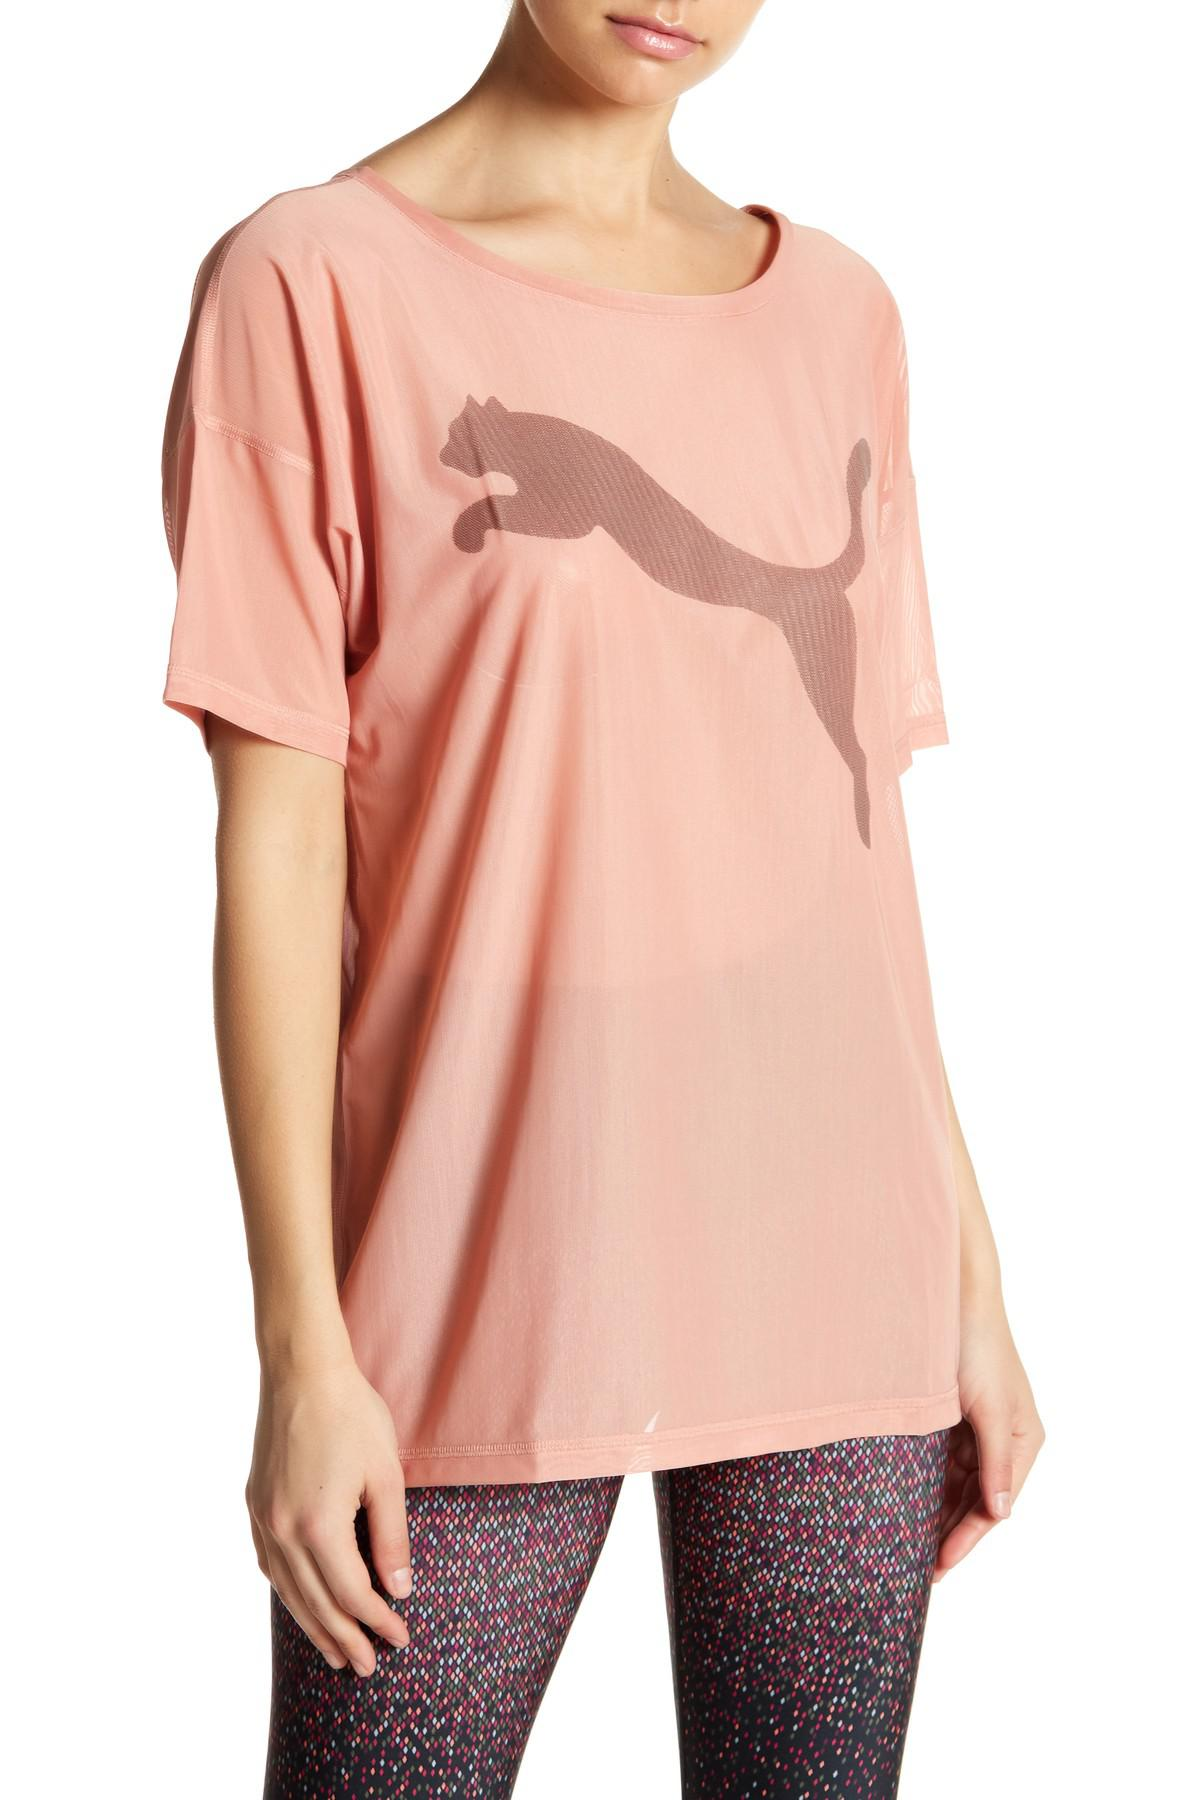 0dbca56f77f Lyst - PUMA Dancer Drapey Mesh Tee in Pink